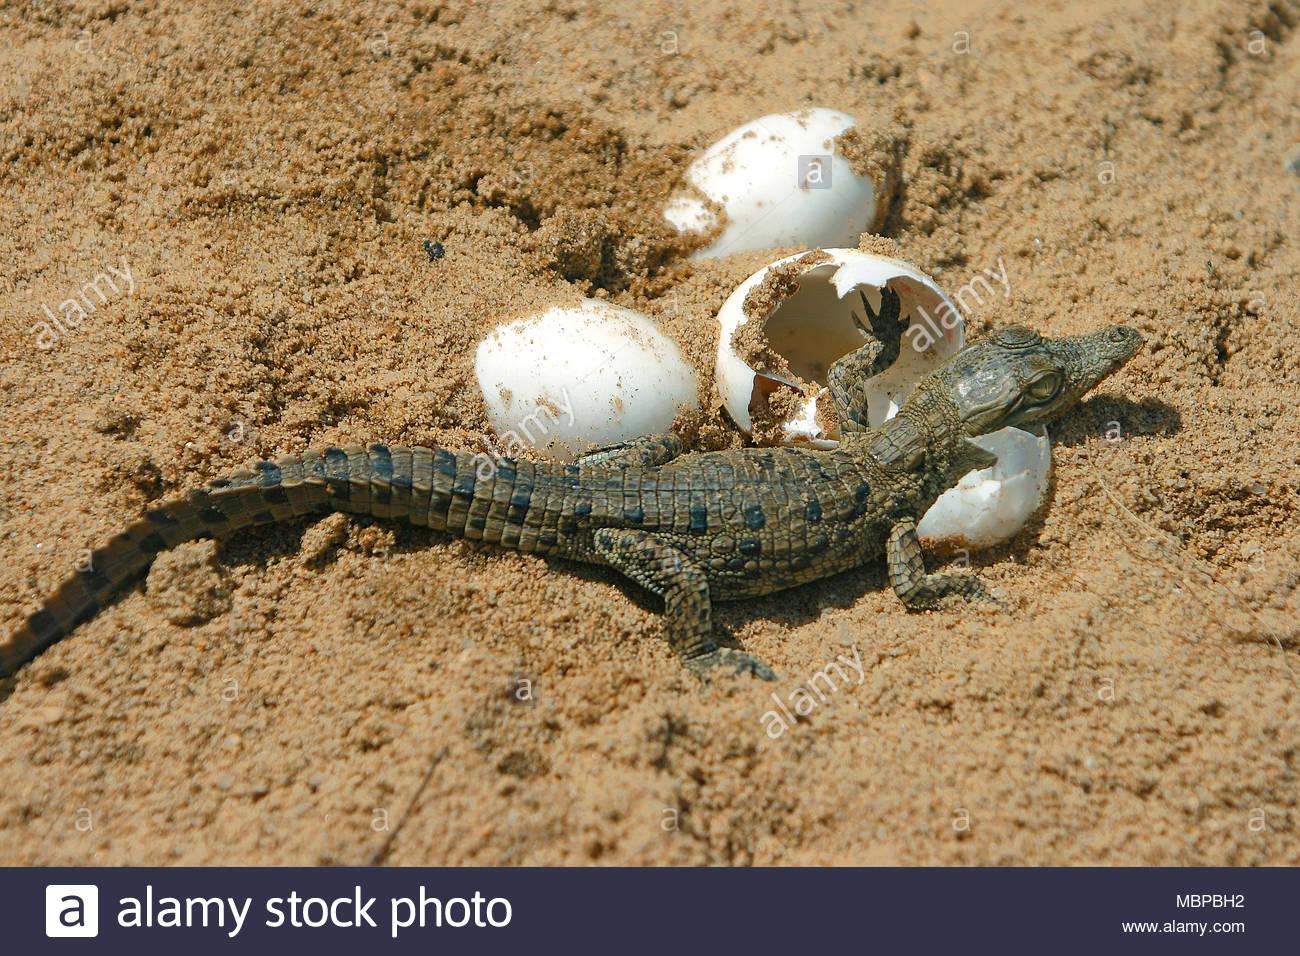 Schluepfendes Nilkrokodil (Crocodylus niloticus), Krokodilbaby, Kenia, Afrika | Nilkrokodil (Crocodylus niloticus), Schraffuren, Kenia, Afrika Stockbild